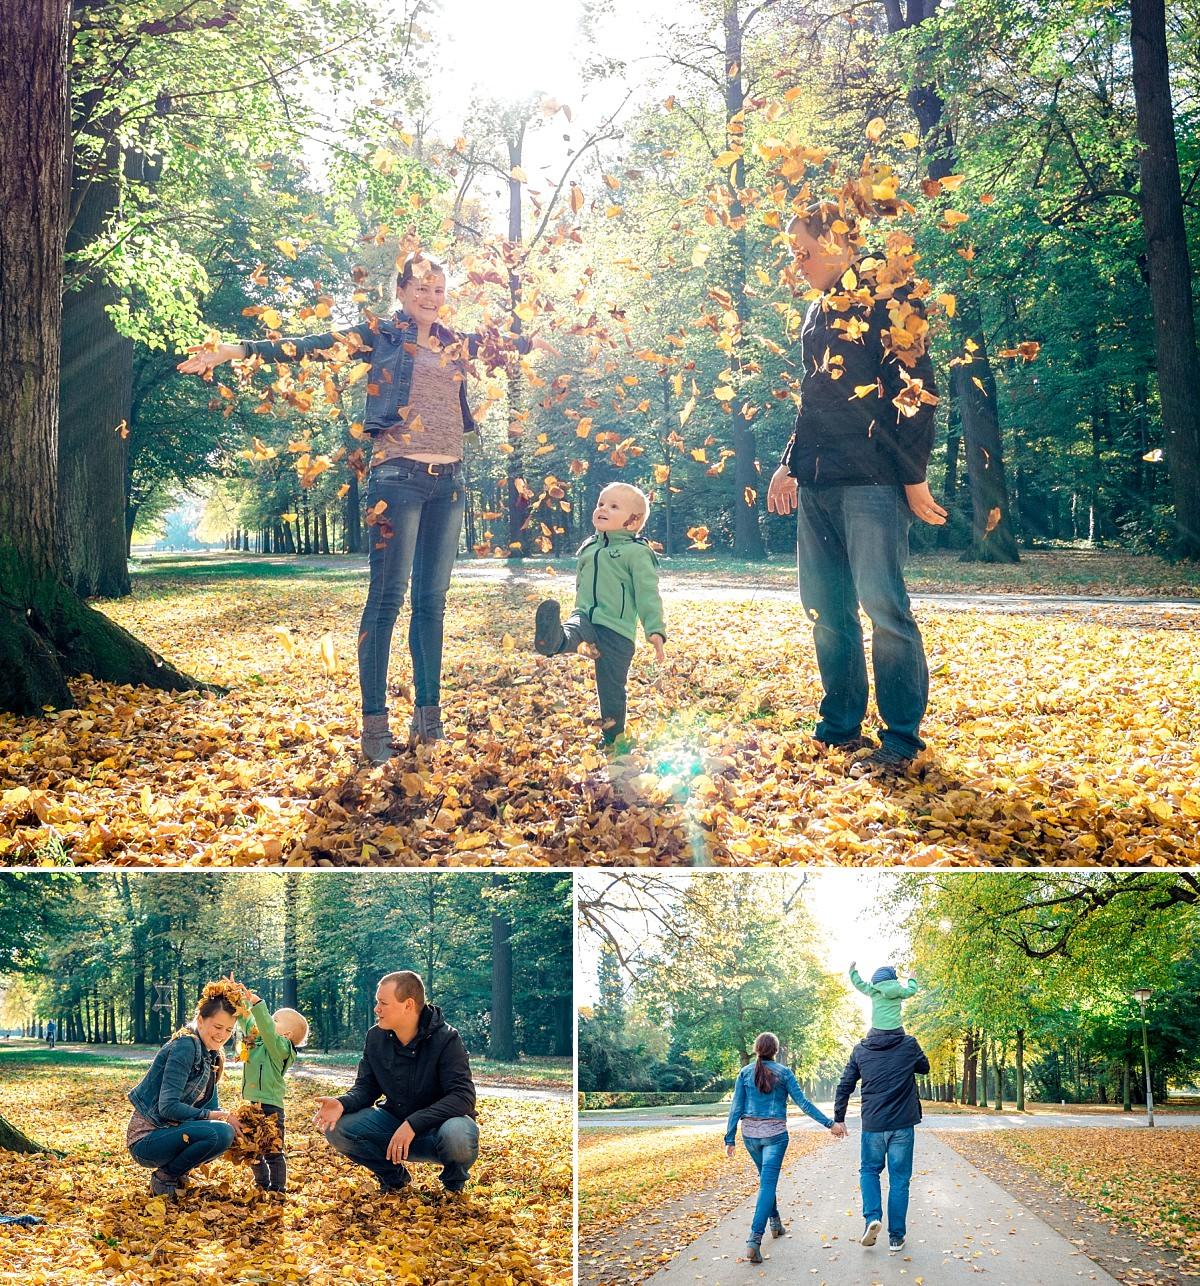 Familienfotos Dresden Herbst Sonne Kind Spaziergang zu dritt spielen im Laub